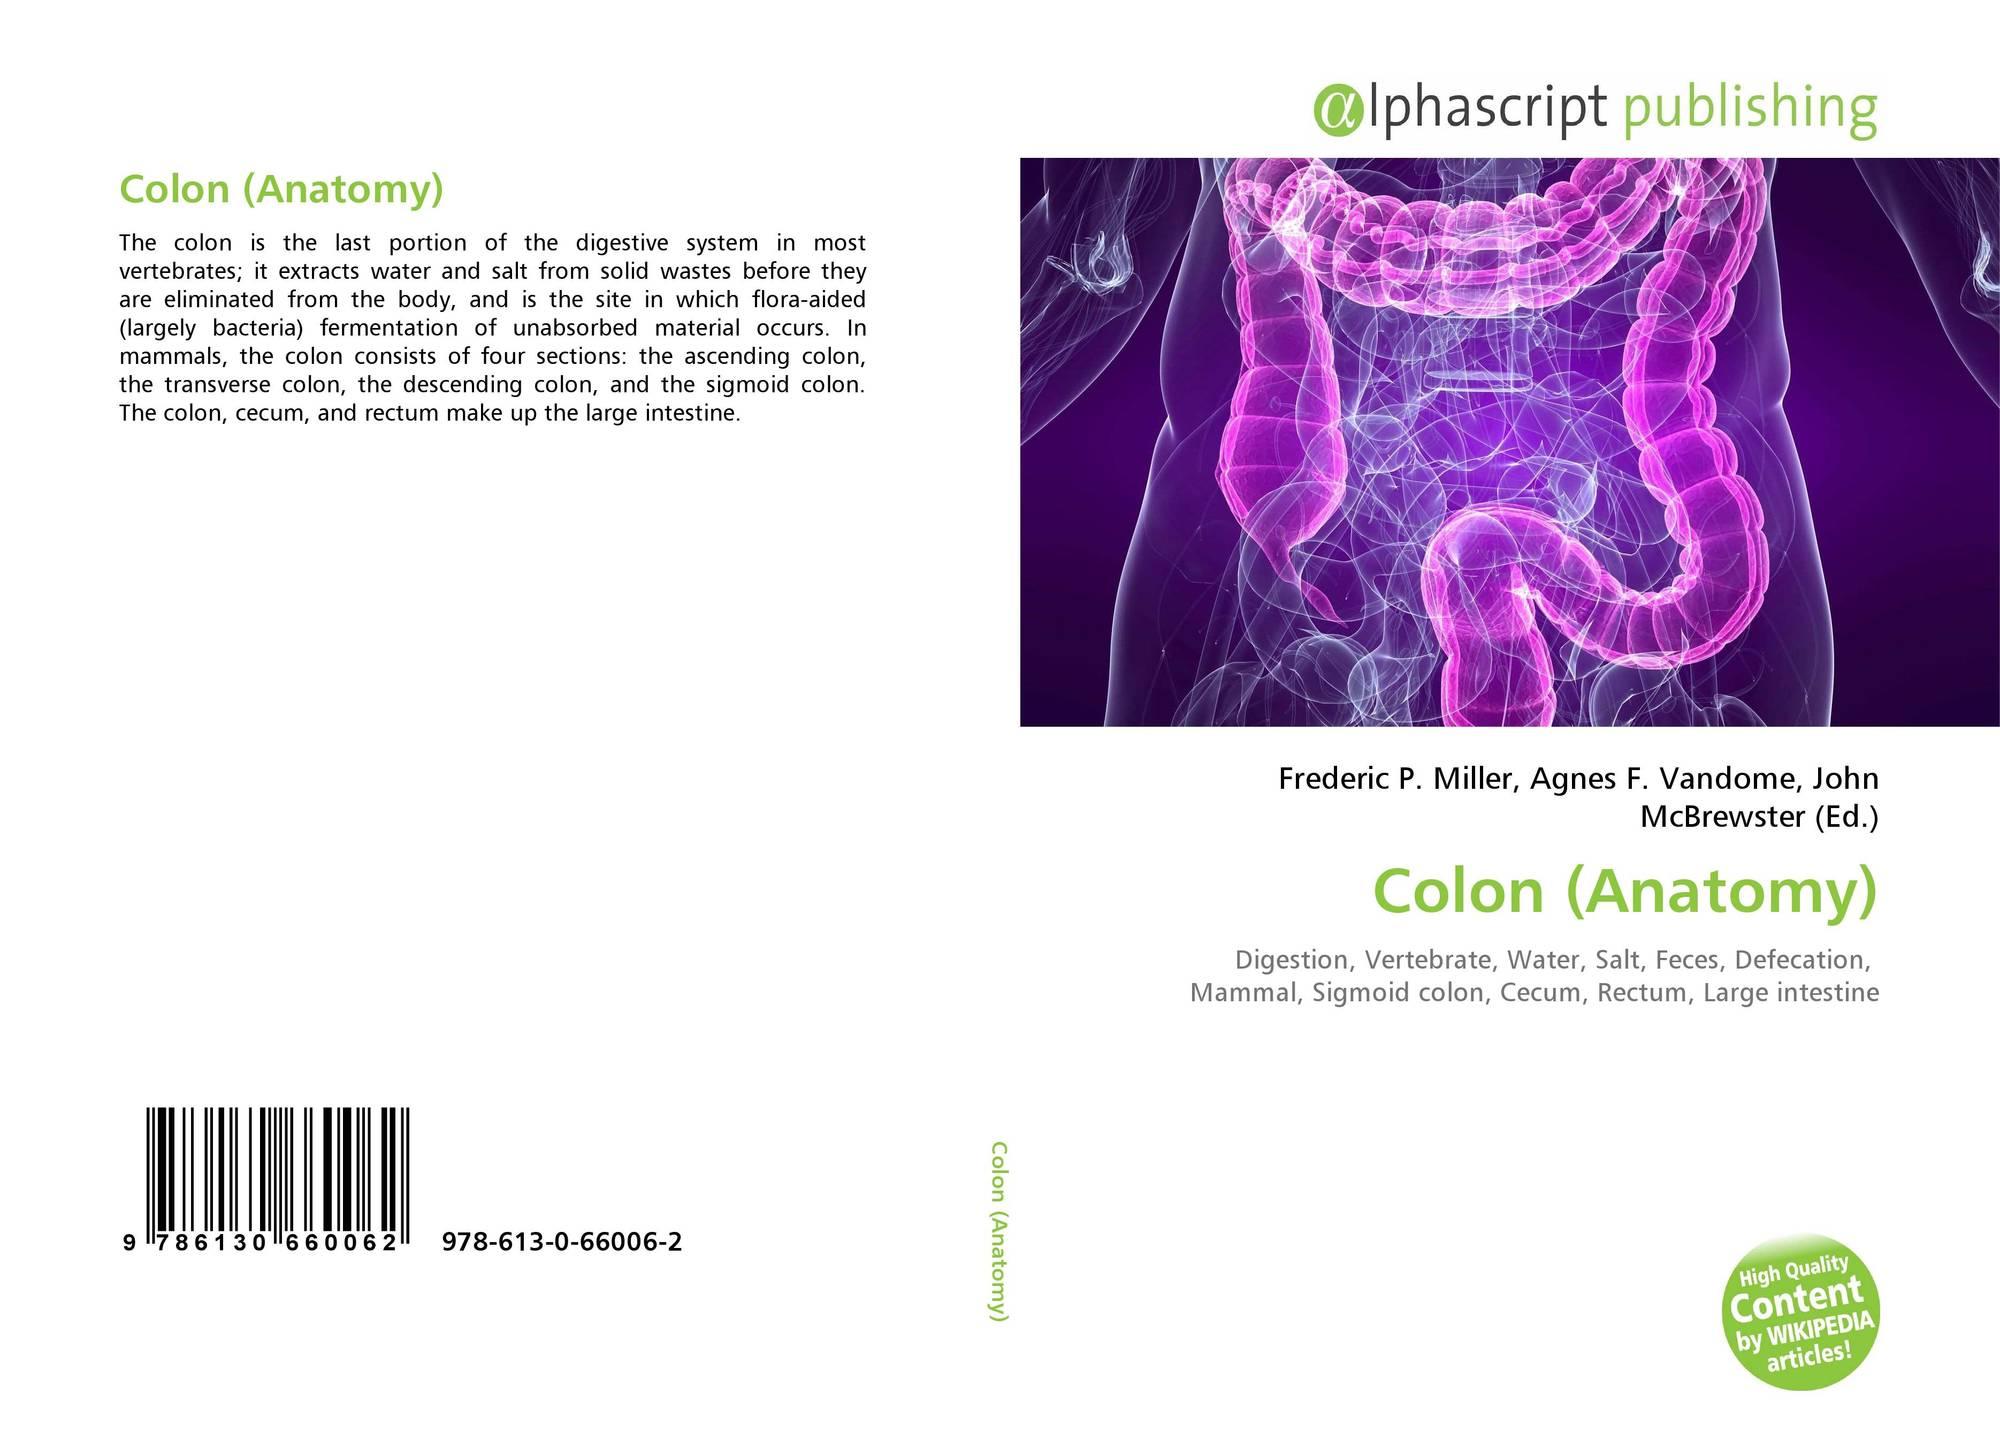 Colon Anatomy 978 613 0 66006 2 6130660065 9786130660062